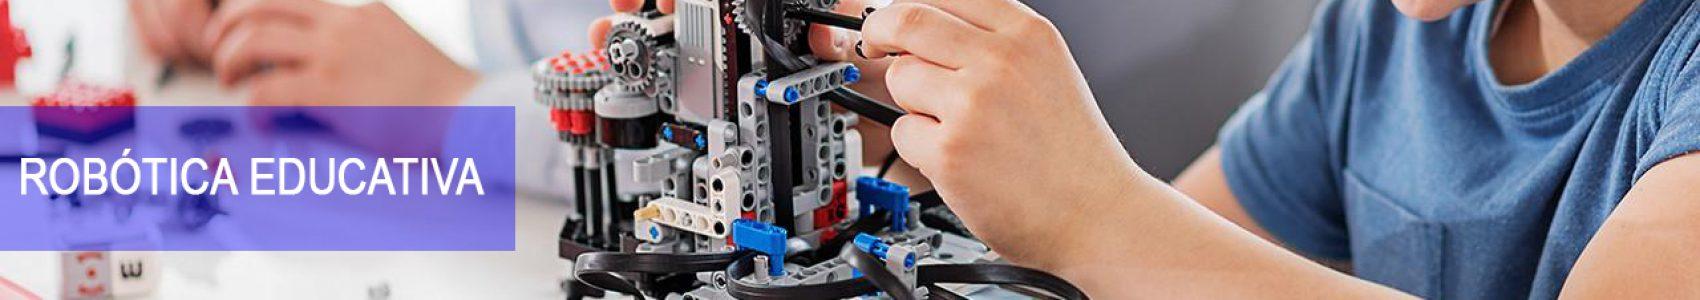 experto robotica educativa educacion secundaria